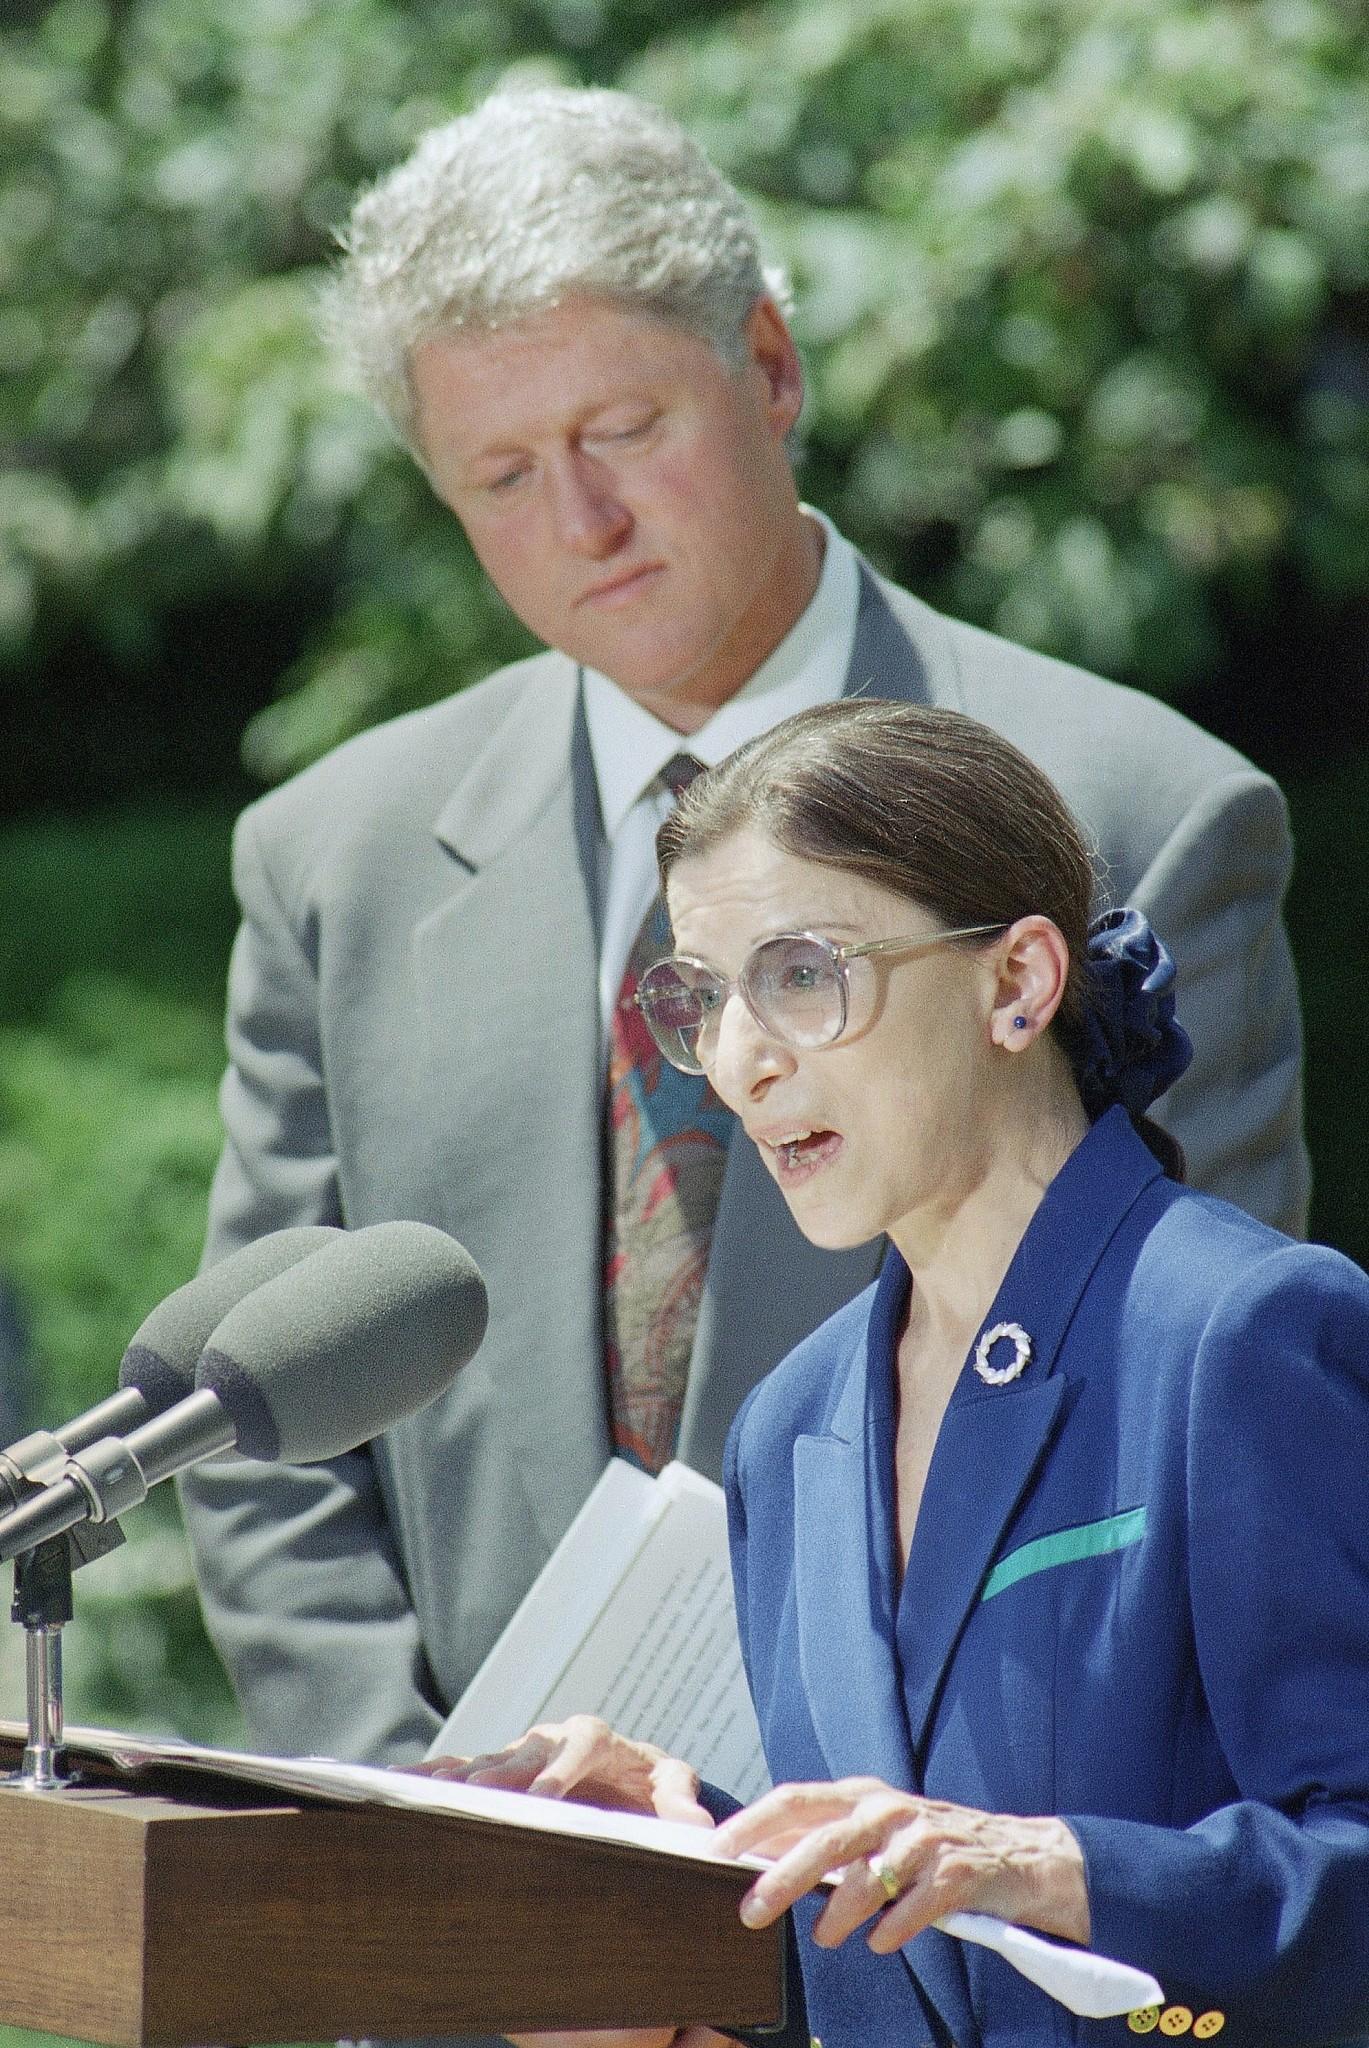 Ruth Bader Ginsburg returns to work after lung cancer surgery  |Ruth Bader Ginsburg